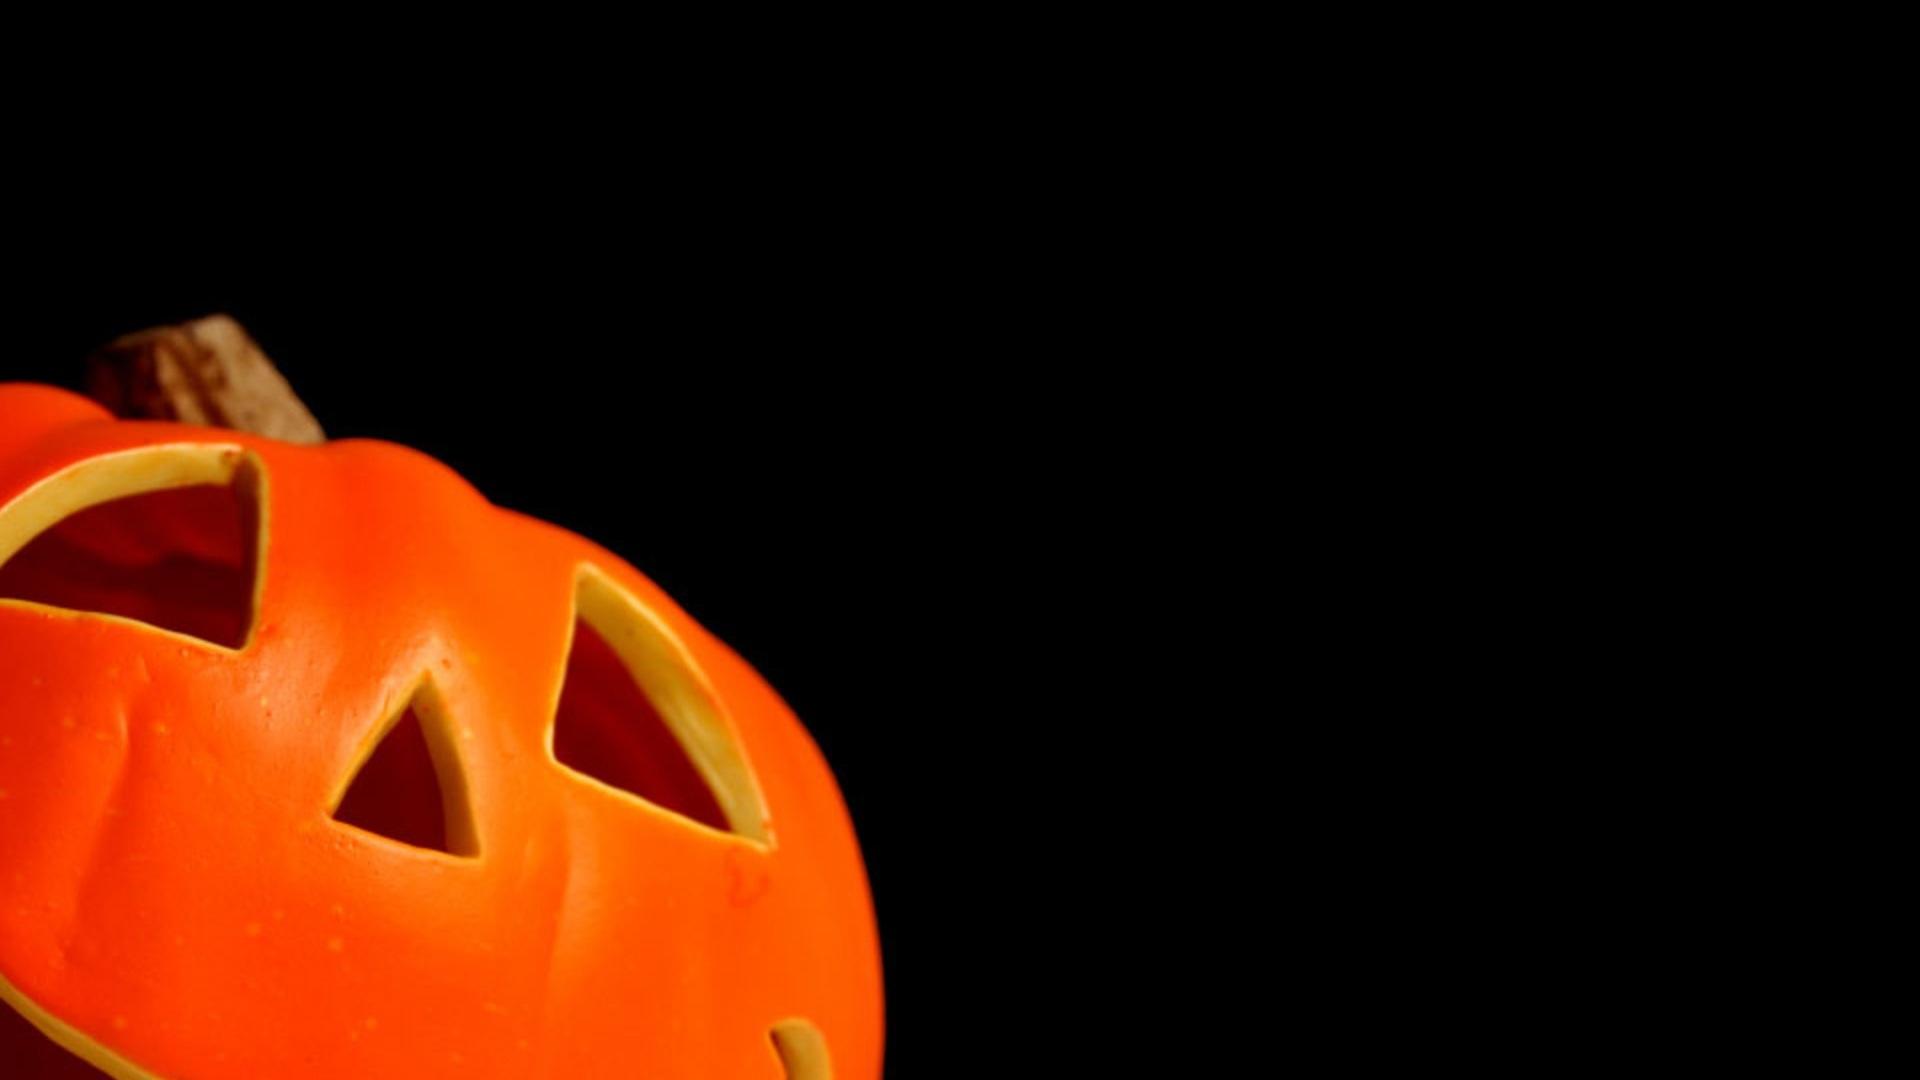 75] Cute Halloween Desktop Wallpaper on WallpaperSafari 1920x1080